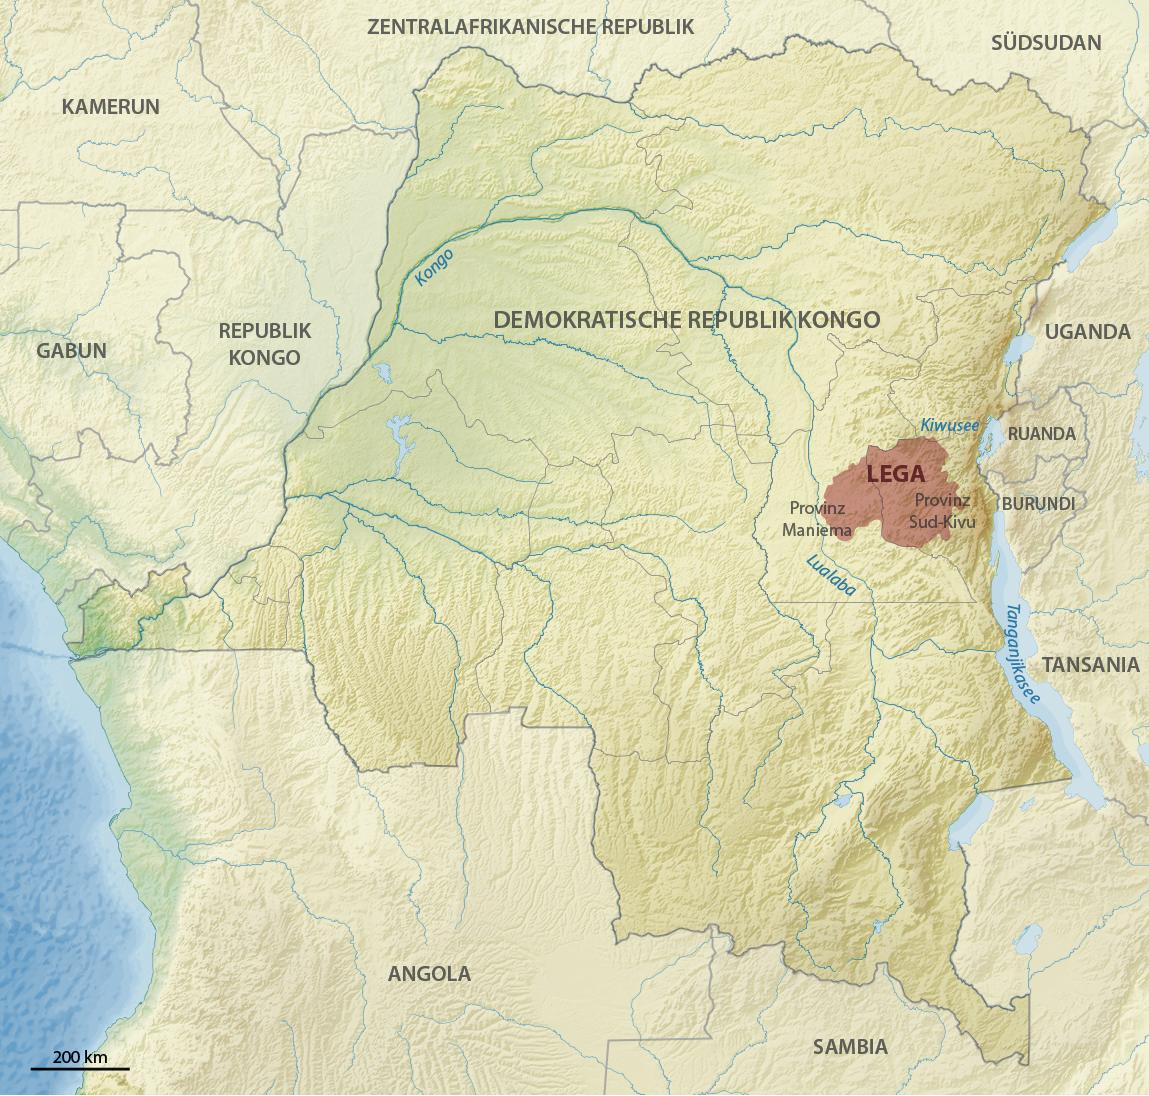 Lega territory map african art Congo